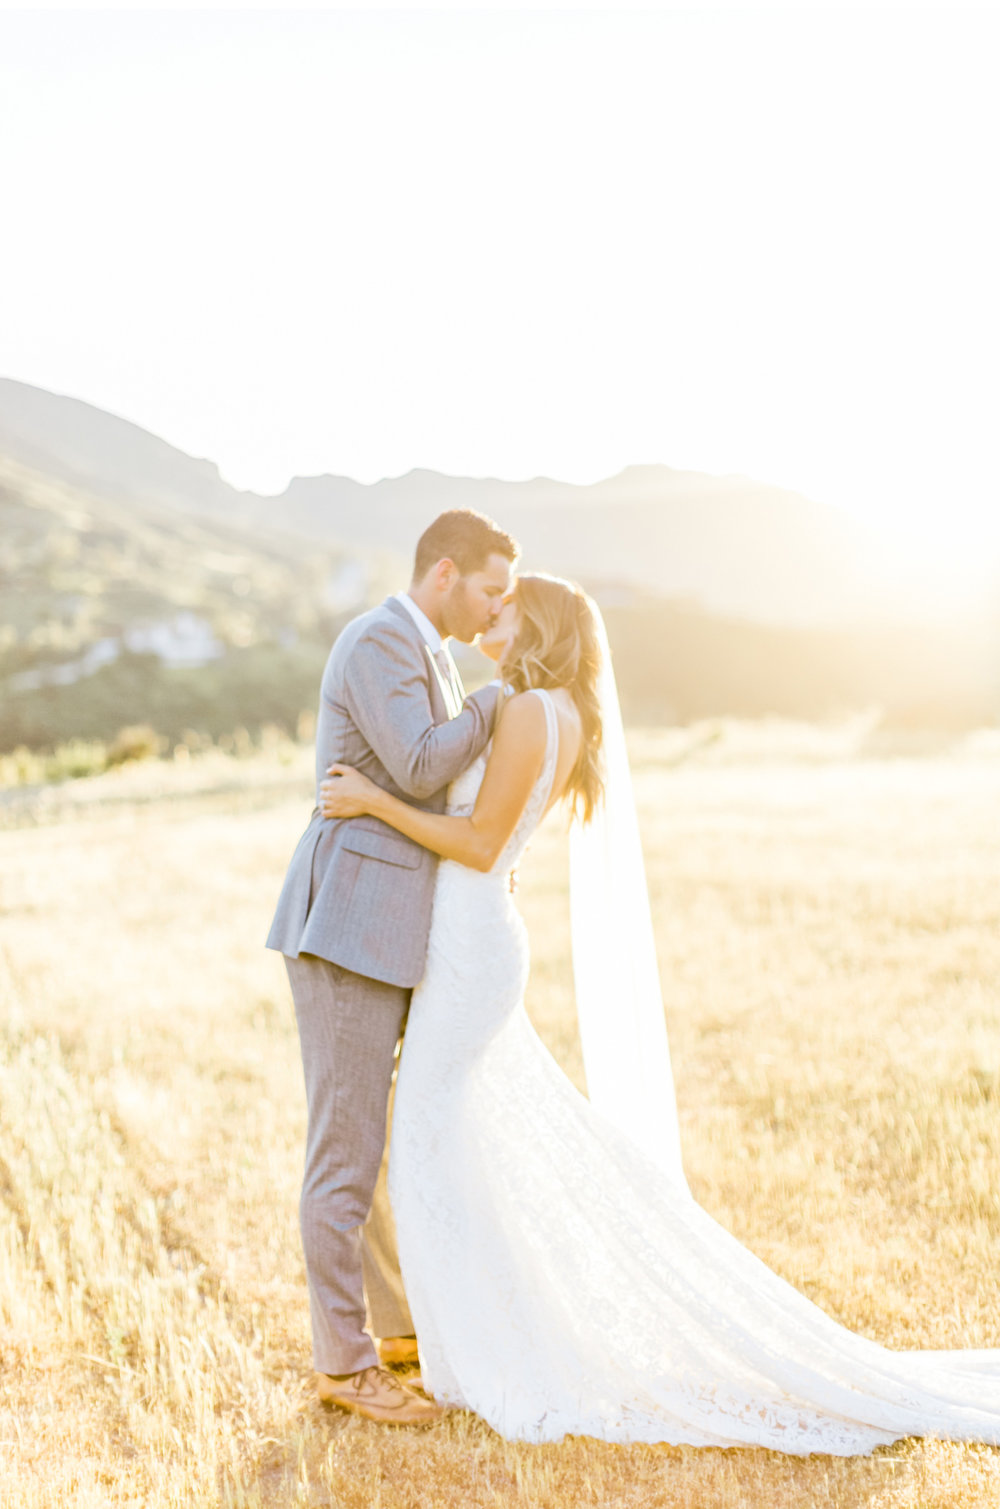 Triunfo-Creek-Malibu-Wedding-Photographer-Natalie-Schutt-Photography_21.jpg